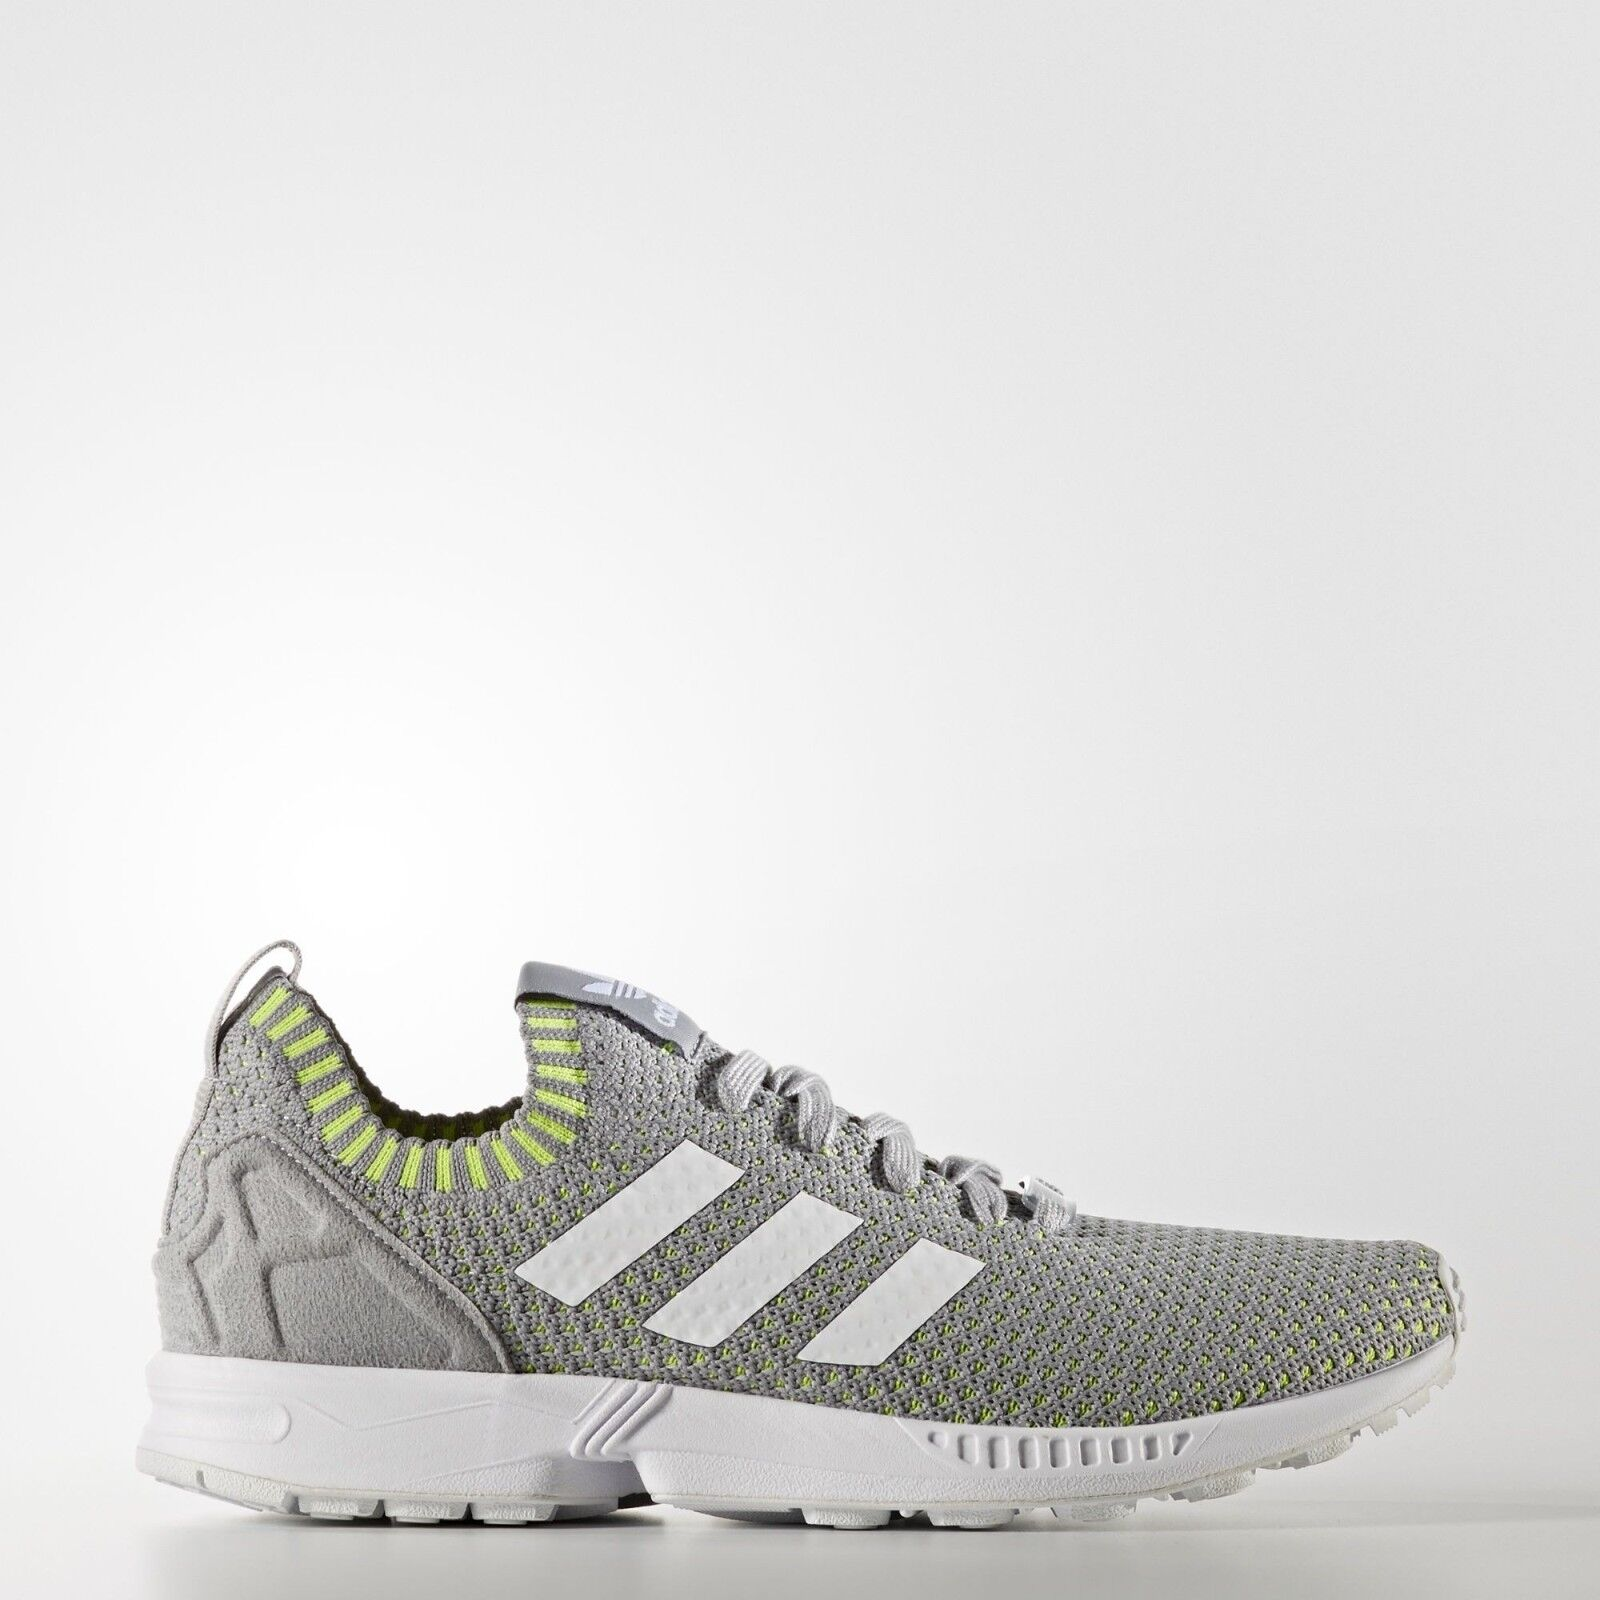 Adidas Adidas Adidas Originals Zx Flux PK Primeknit Grey   Yellow Casual shoes Sz 8 BA7376 26ff84